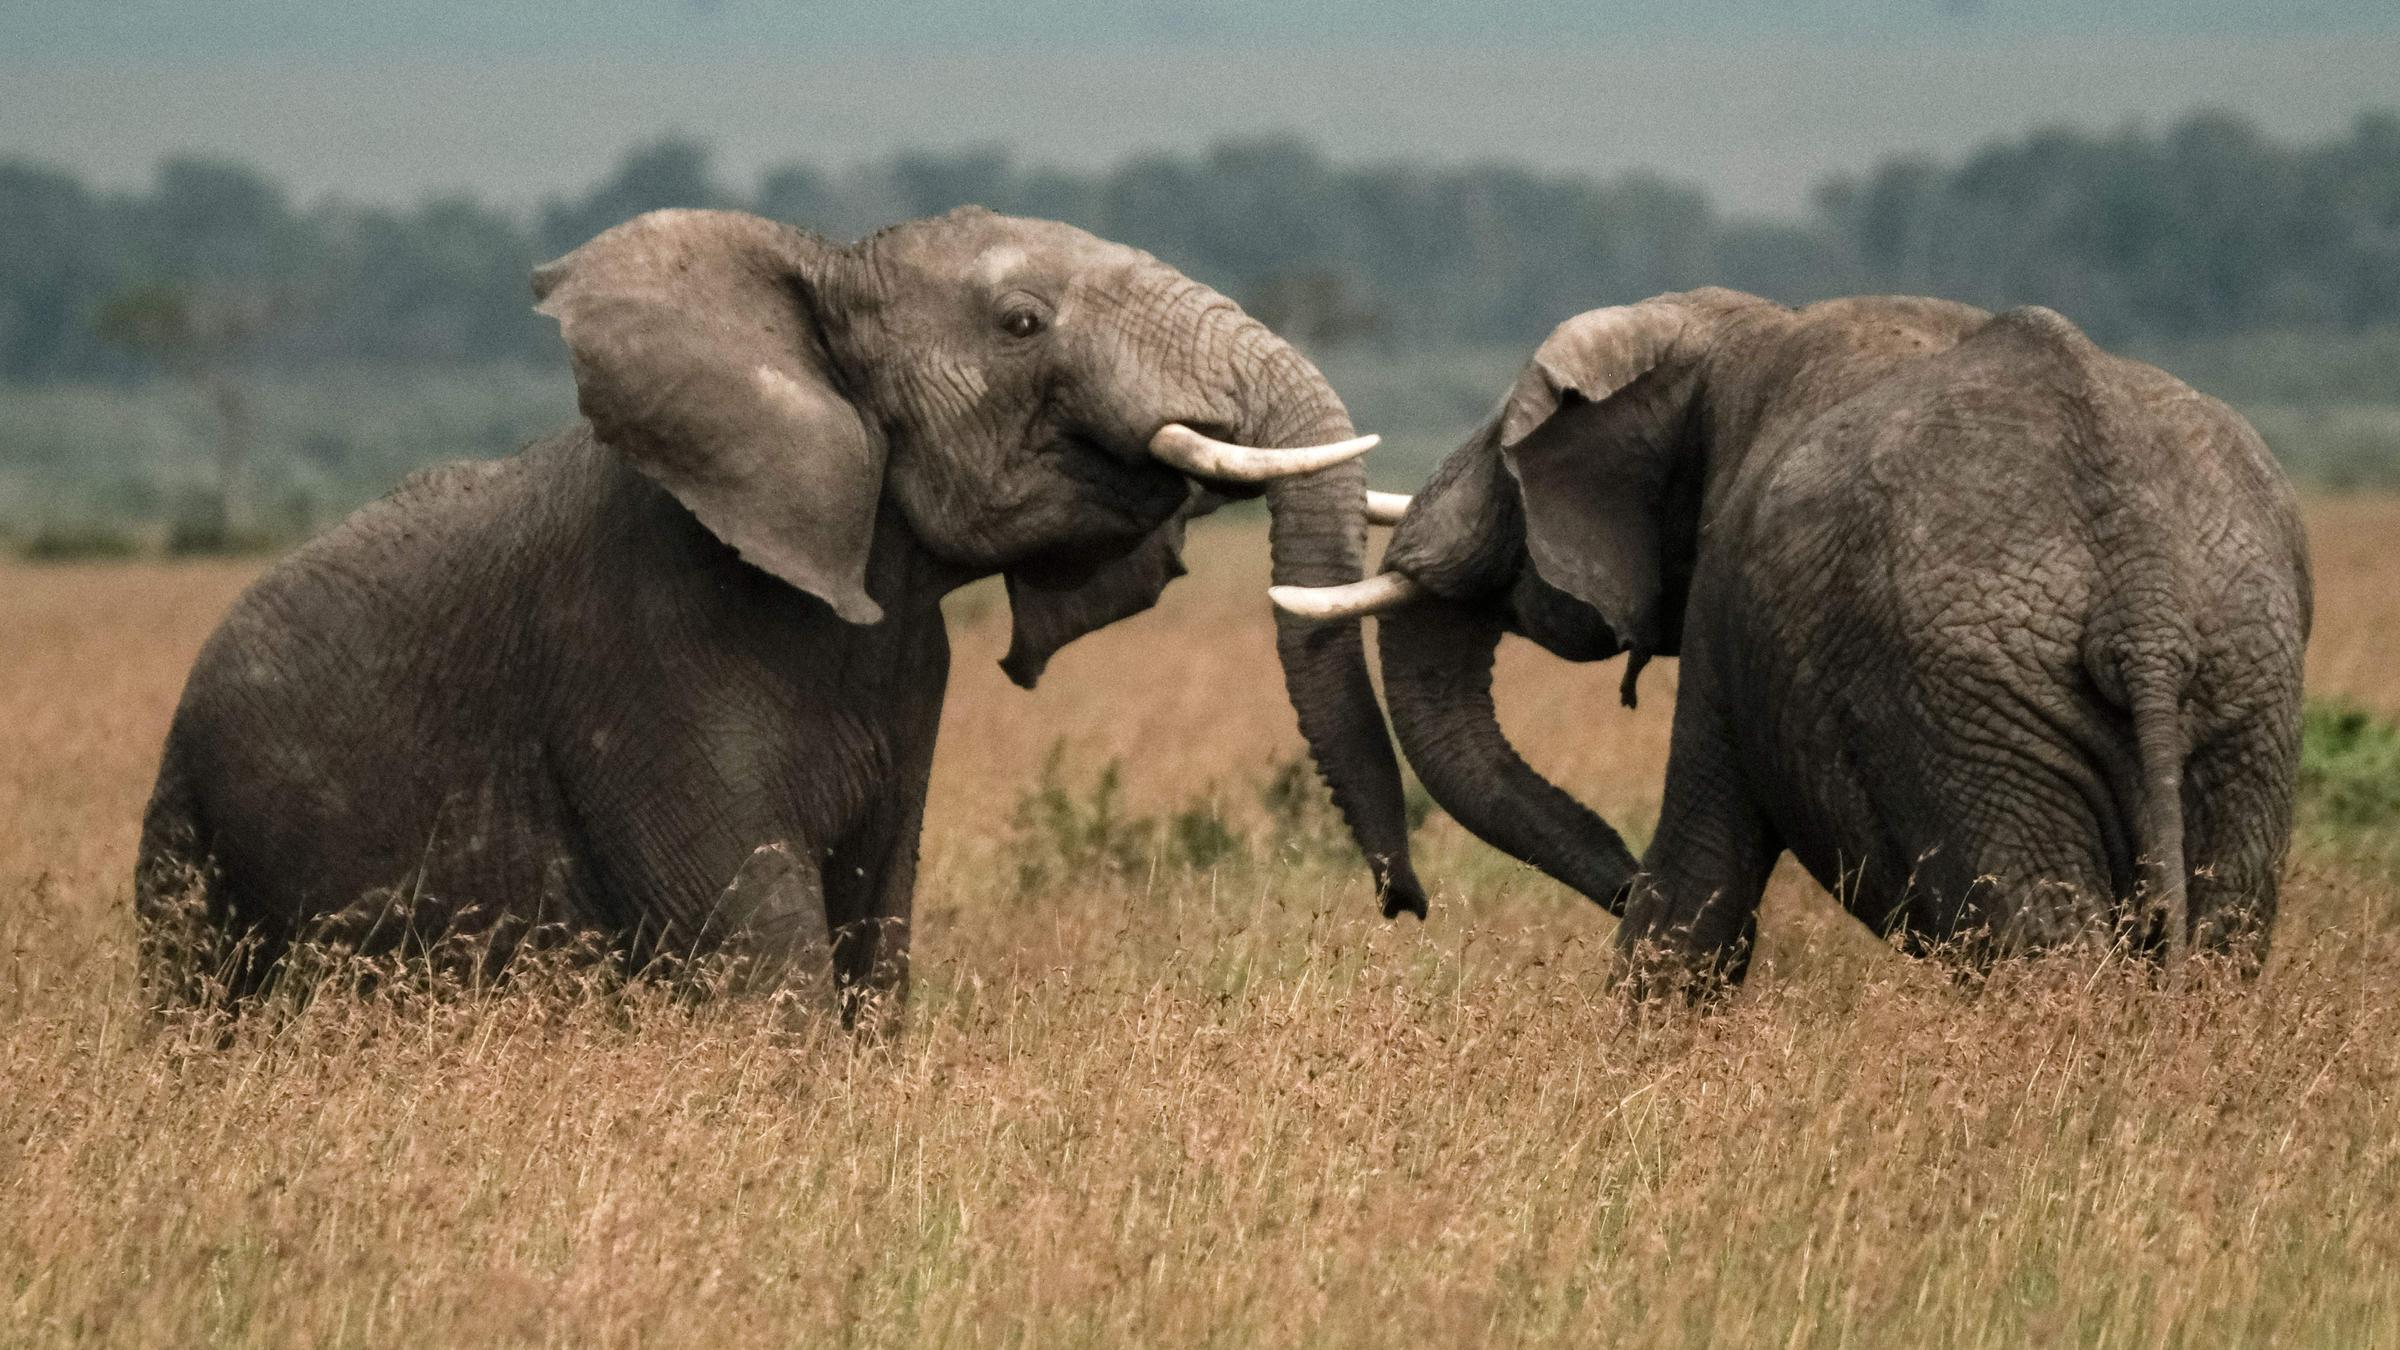 U.S. to Allow Elephant Trophy Imports Despite Trump's Condemnation